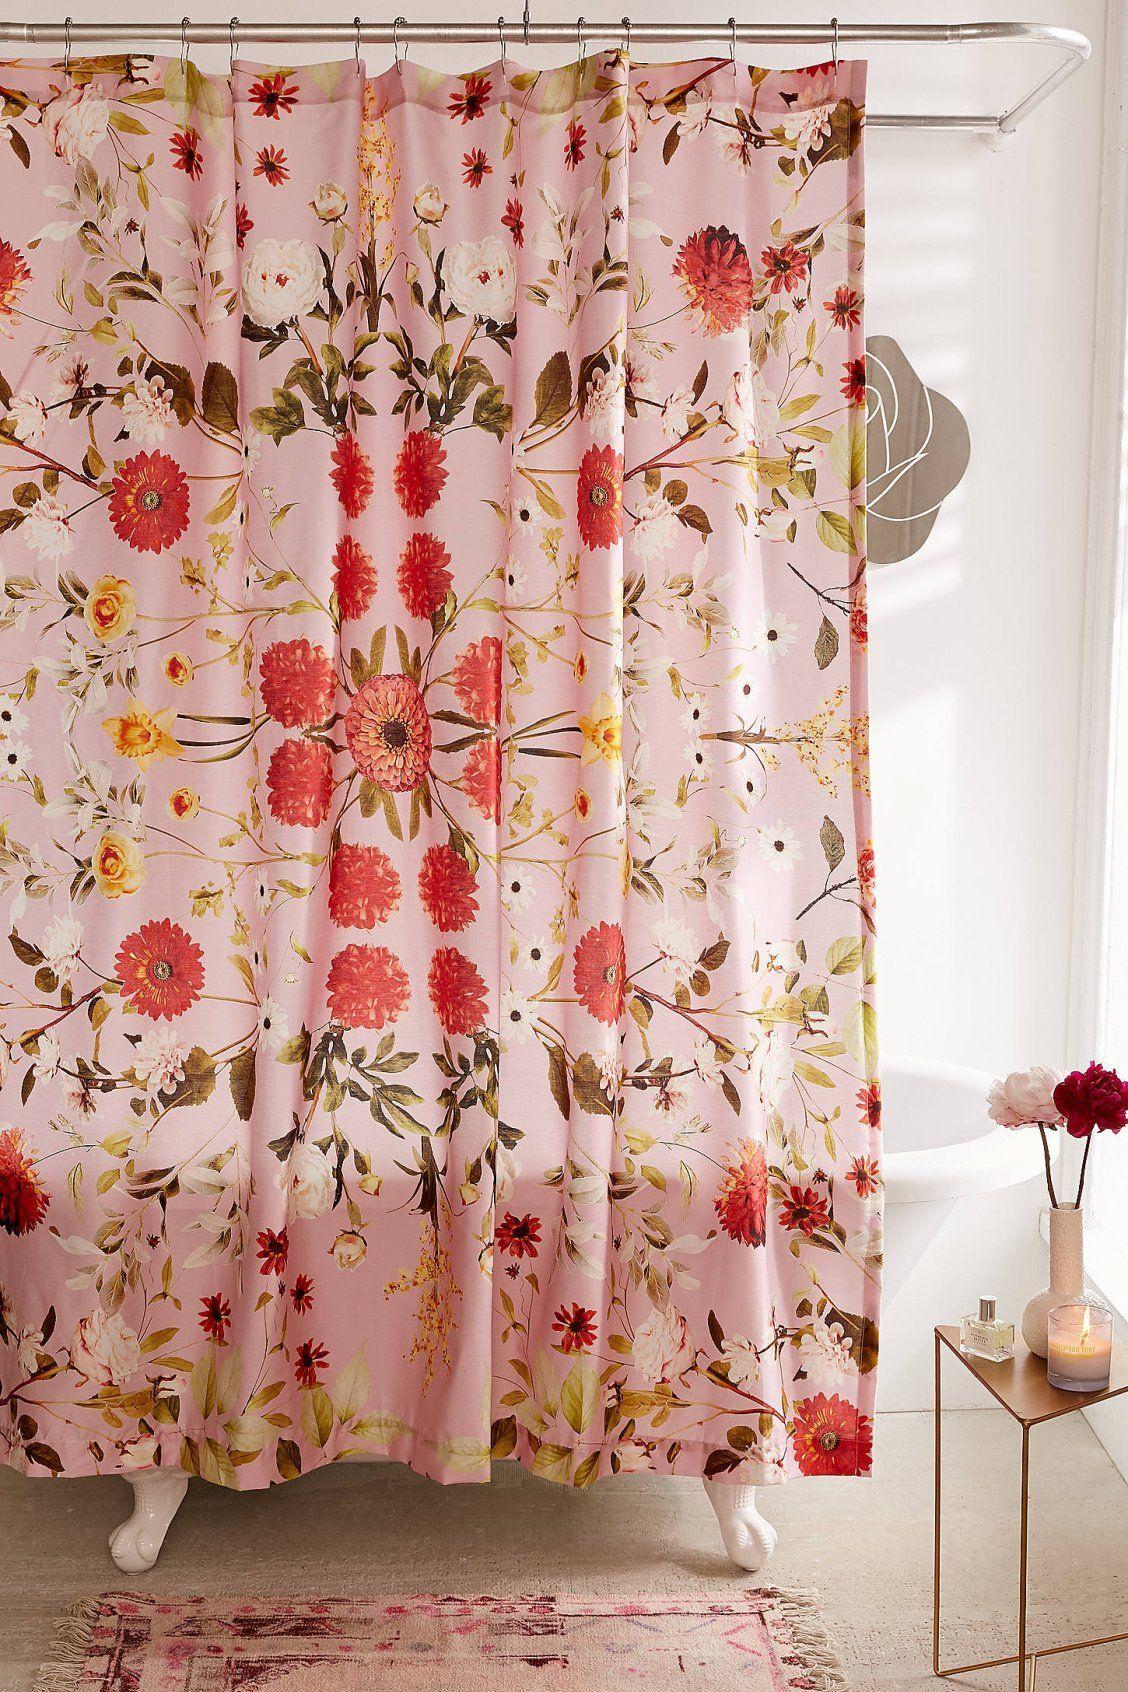 Shower Curtain Liner Floral Shower Curtains Vintage Home Decor Home Decor